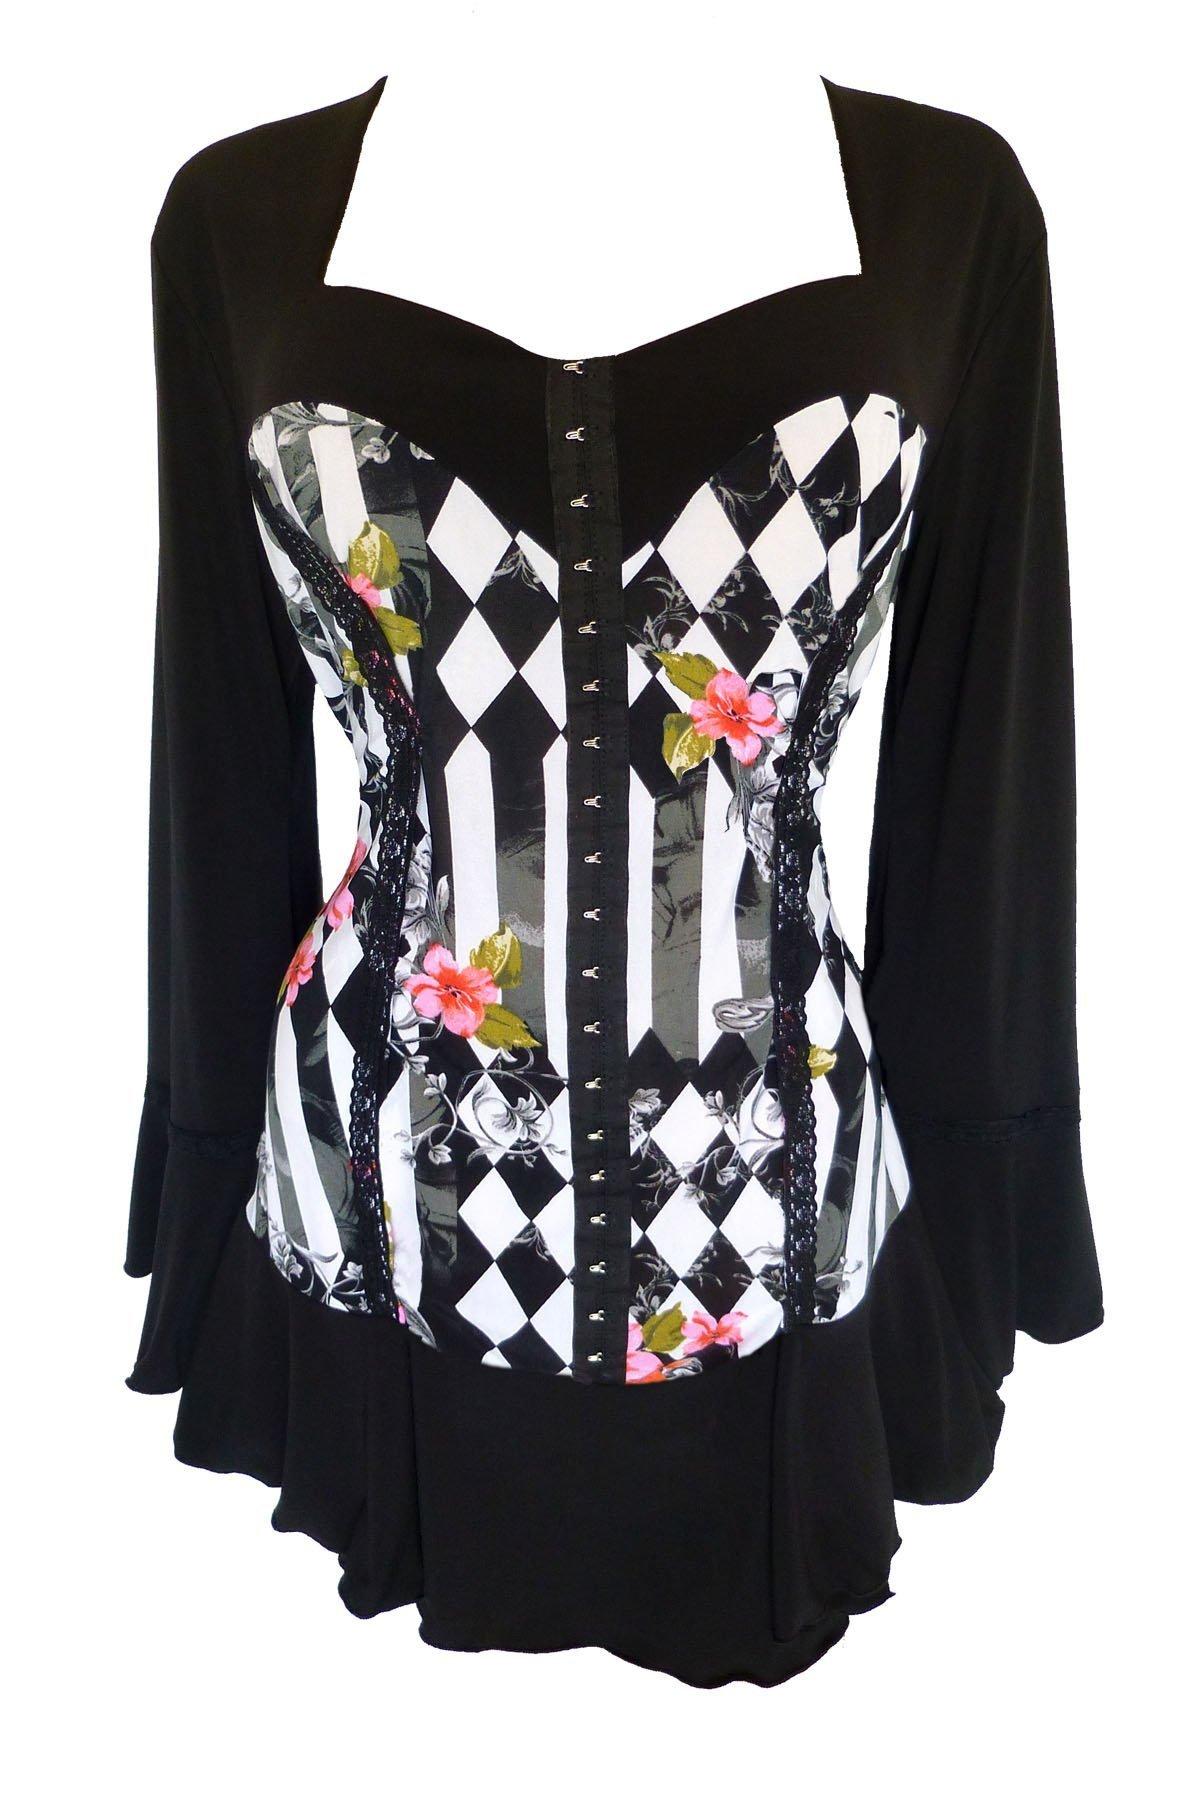 a5f9b85801 Dare To Wear Victorian Gothic Boho Women s Corsetta Corset Top Wonderland L